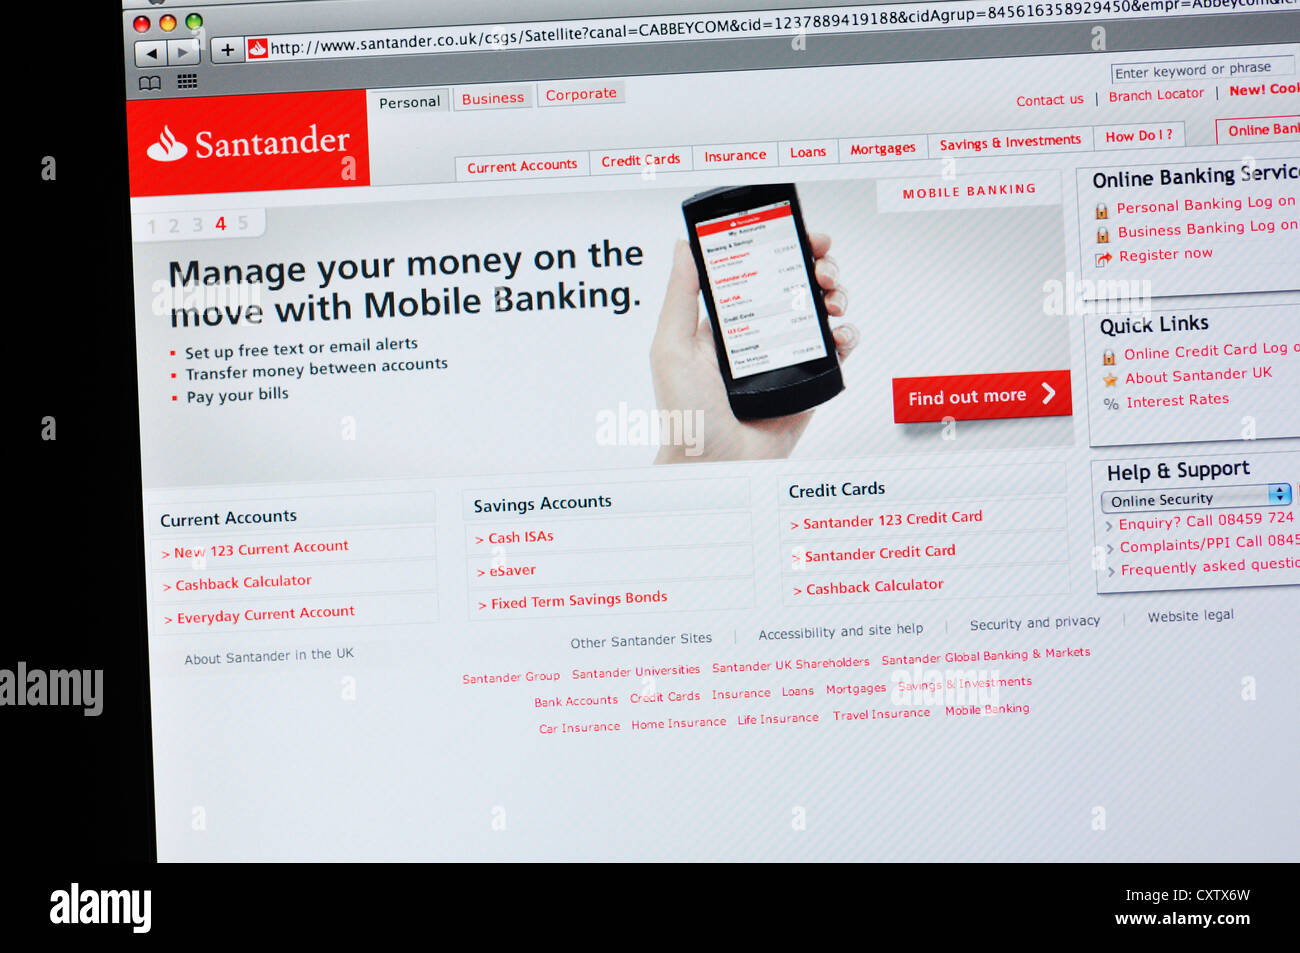 Santander bank website - online banking Stock Photo: 50949217 - Alamy